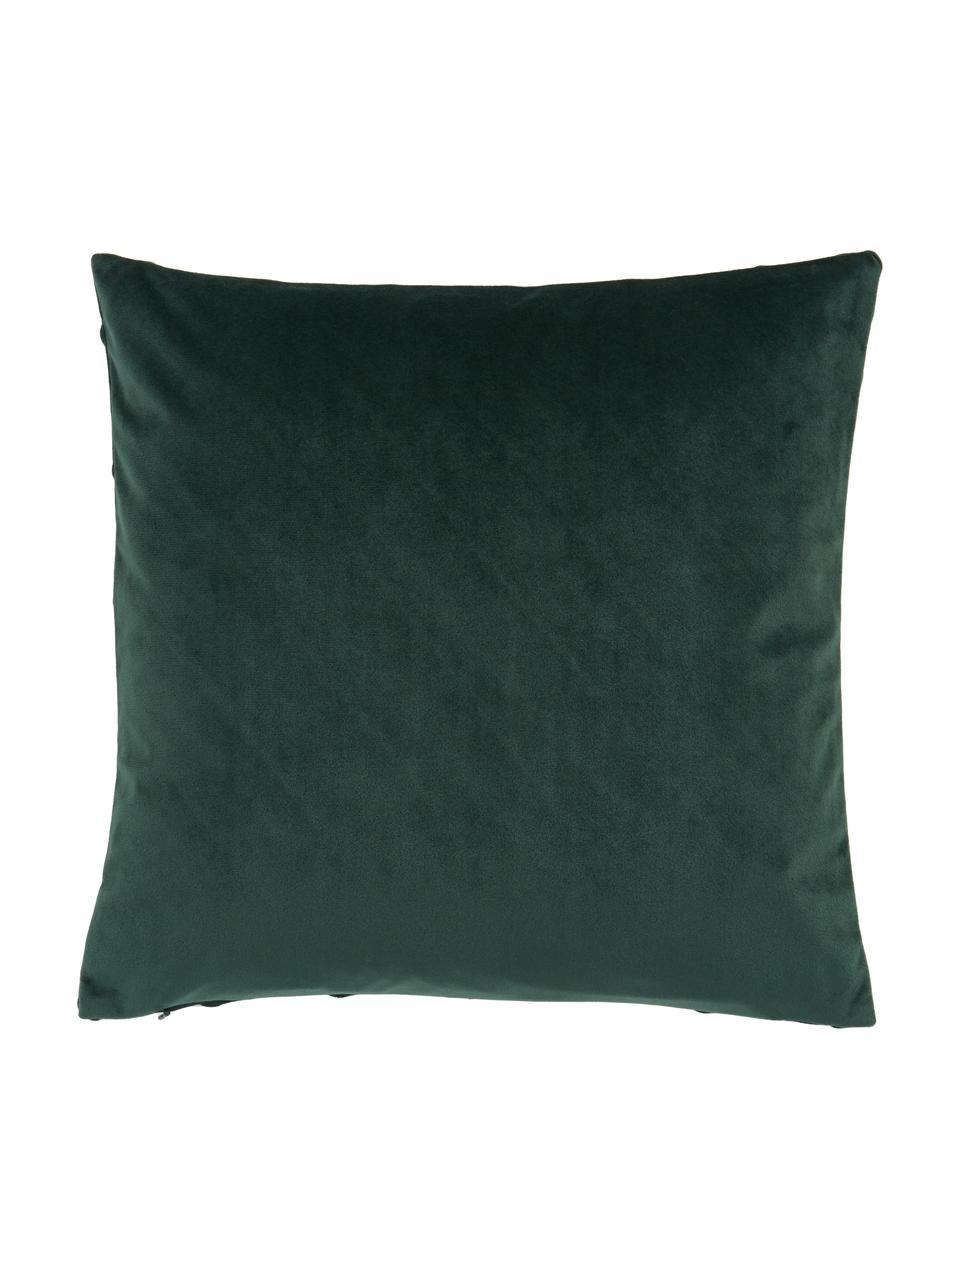 Samt-Kissenhülle Leyla in Dunkelgrün mit Struktumuster, Samt (100% Polyester), Grün, 40 x 40 cm